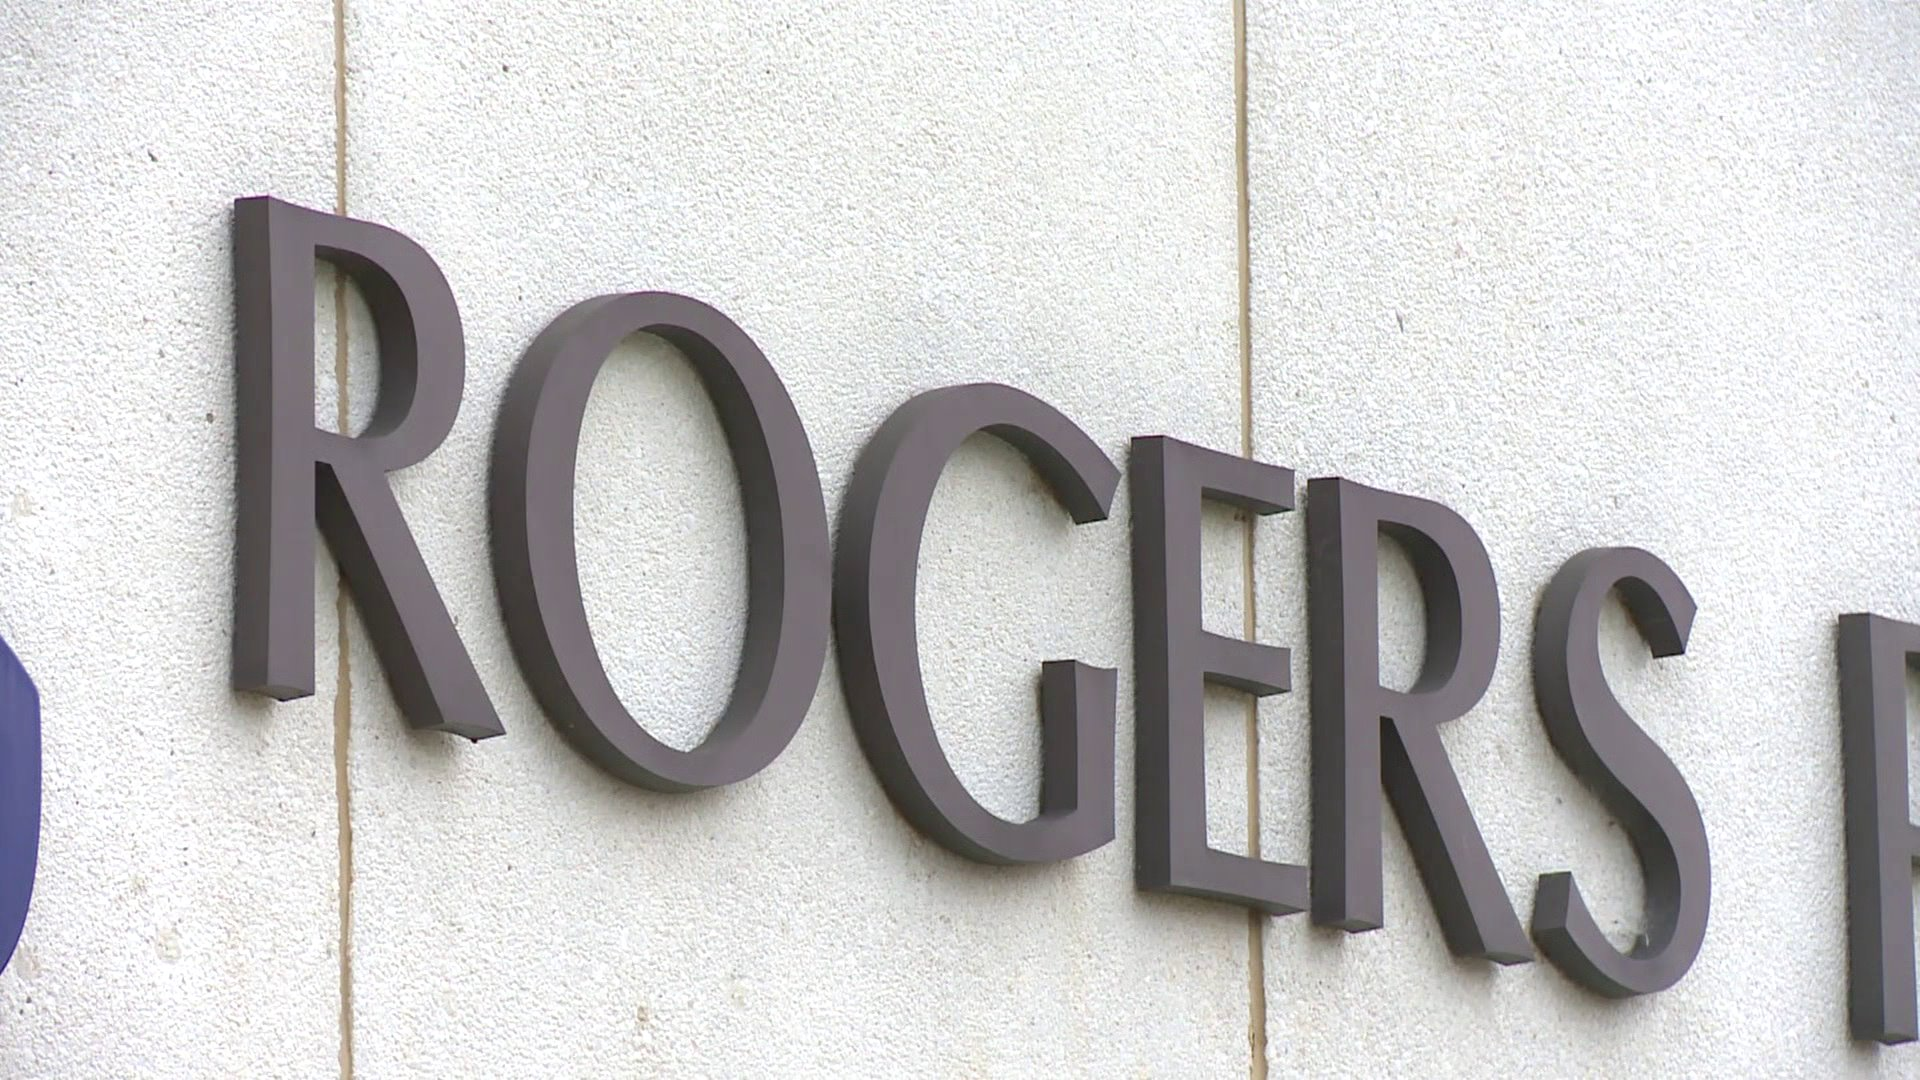 rogers-millage